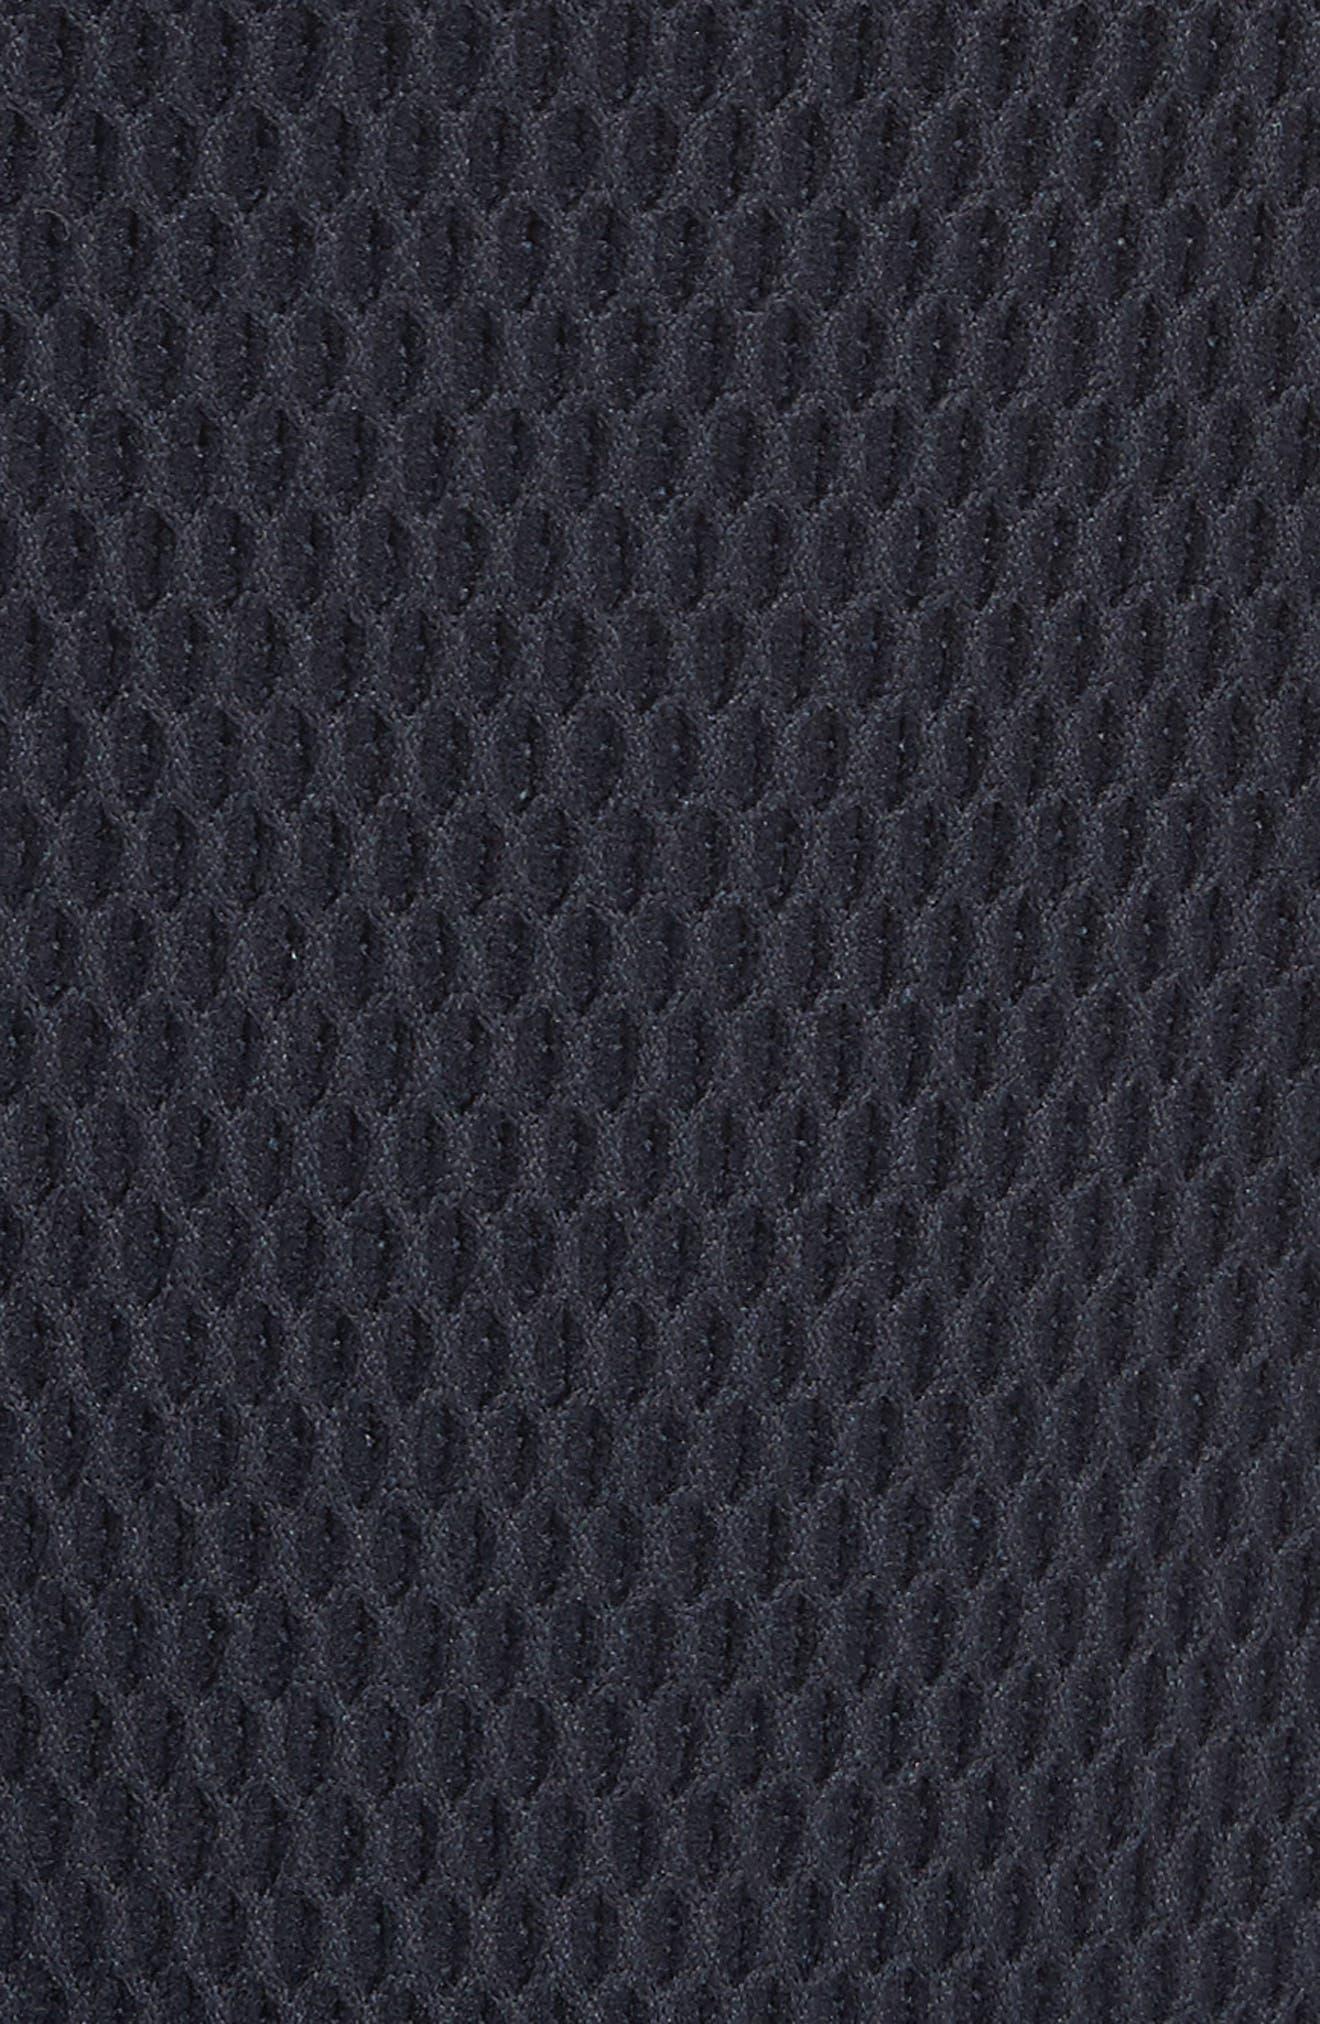 Honeycomb Knit Jersey Coat,                             Alternate thumbnail 5, color,                             Navy